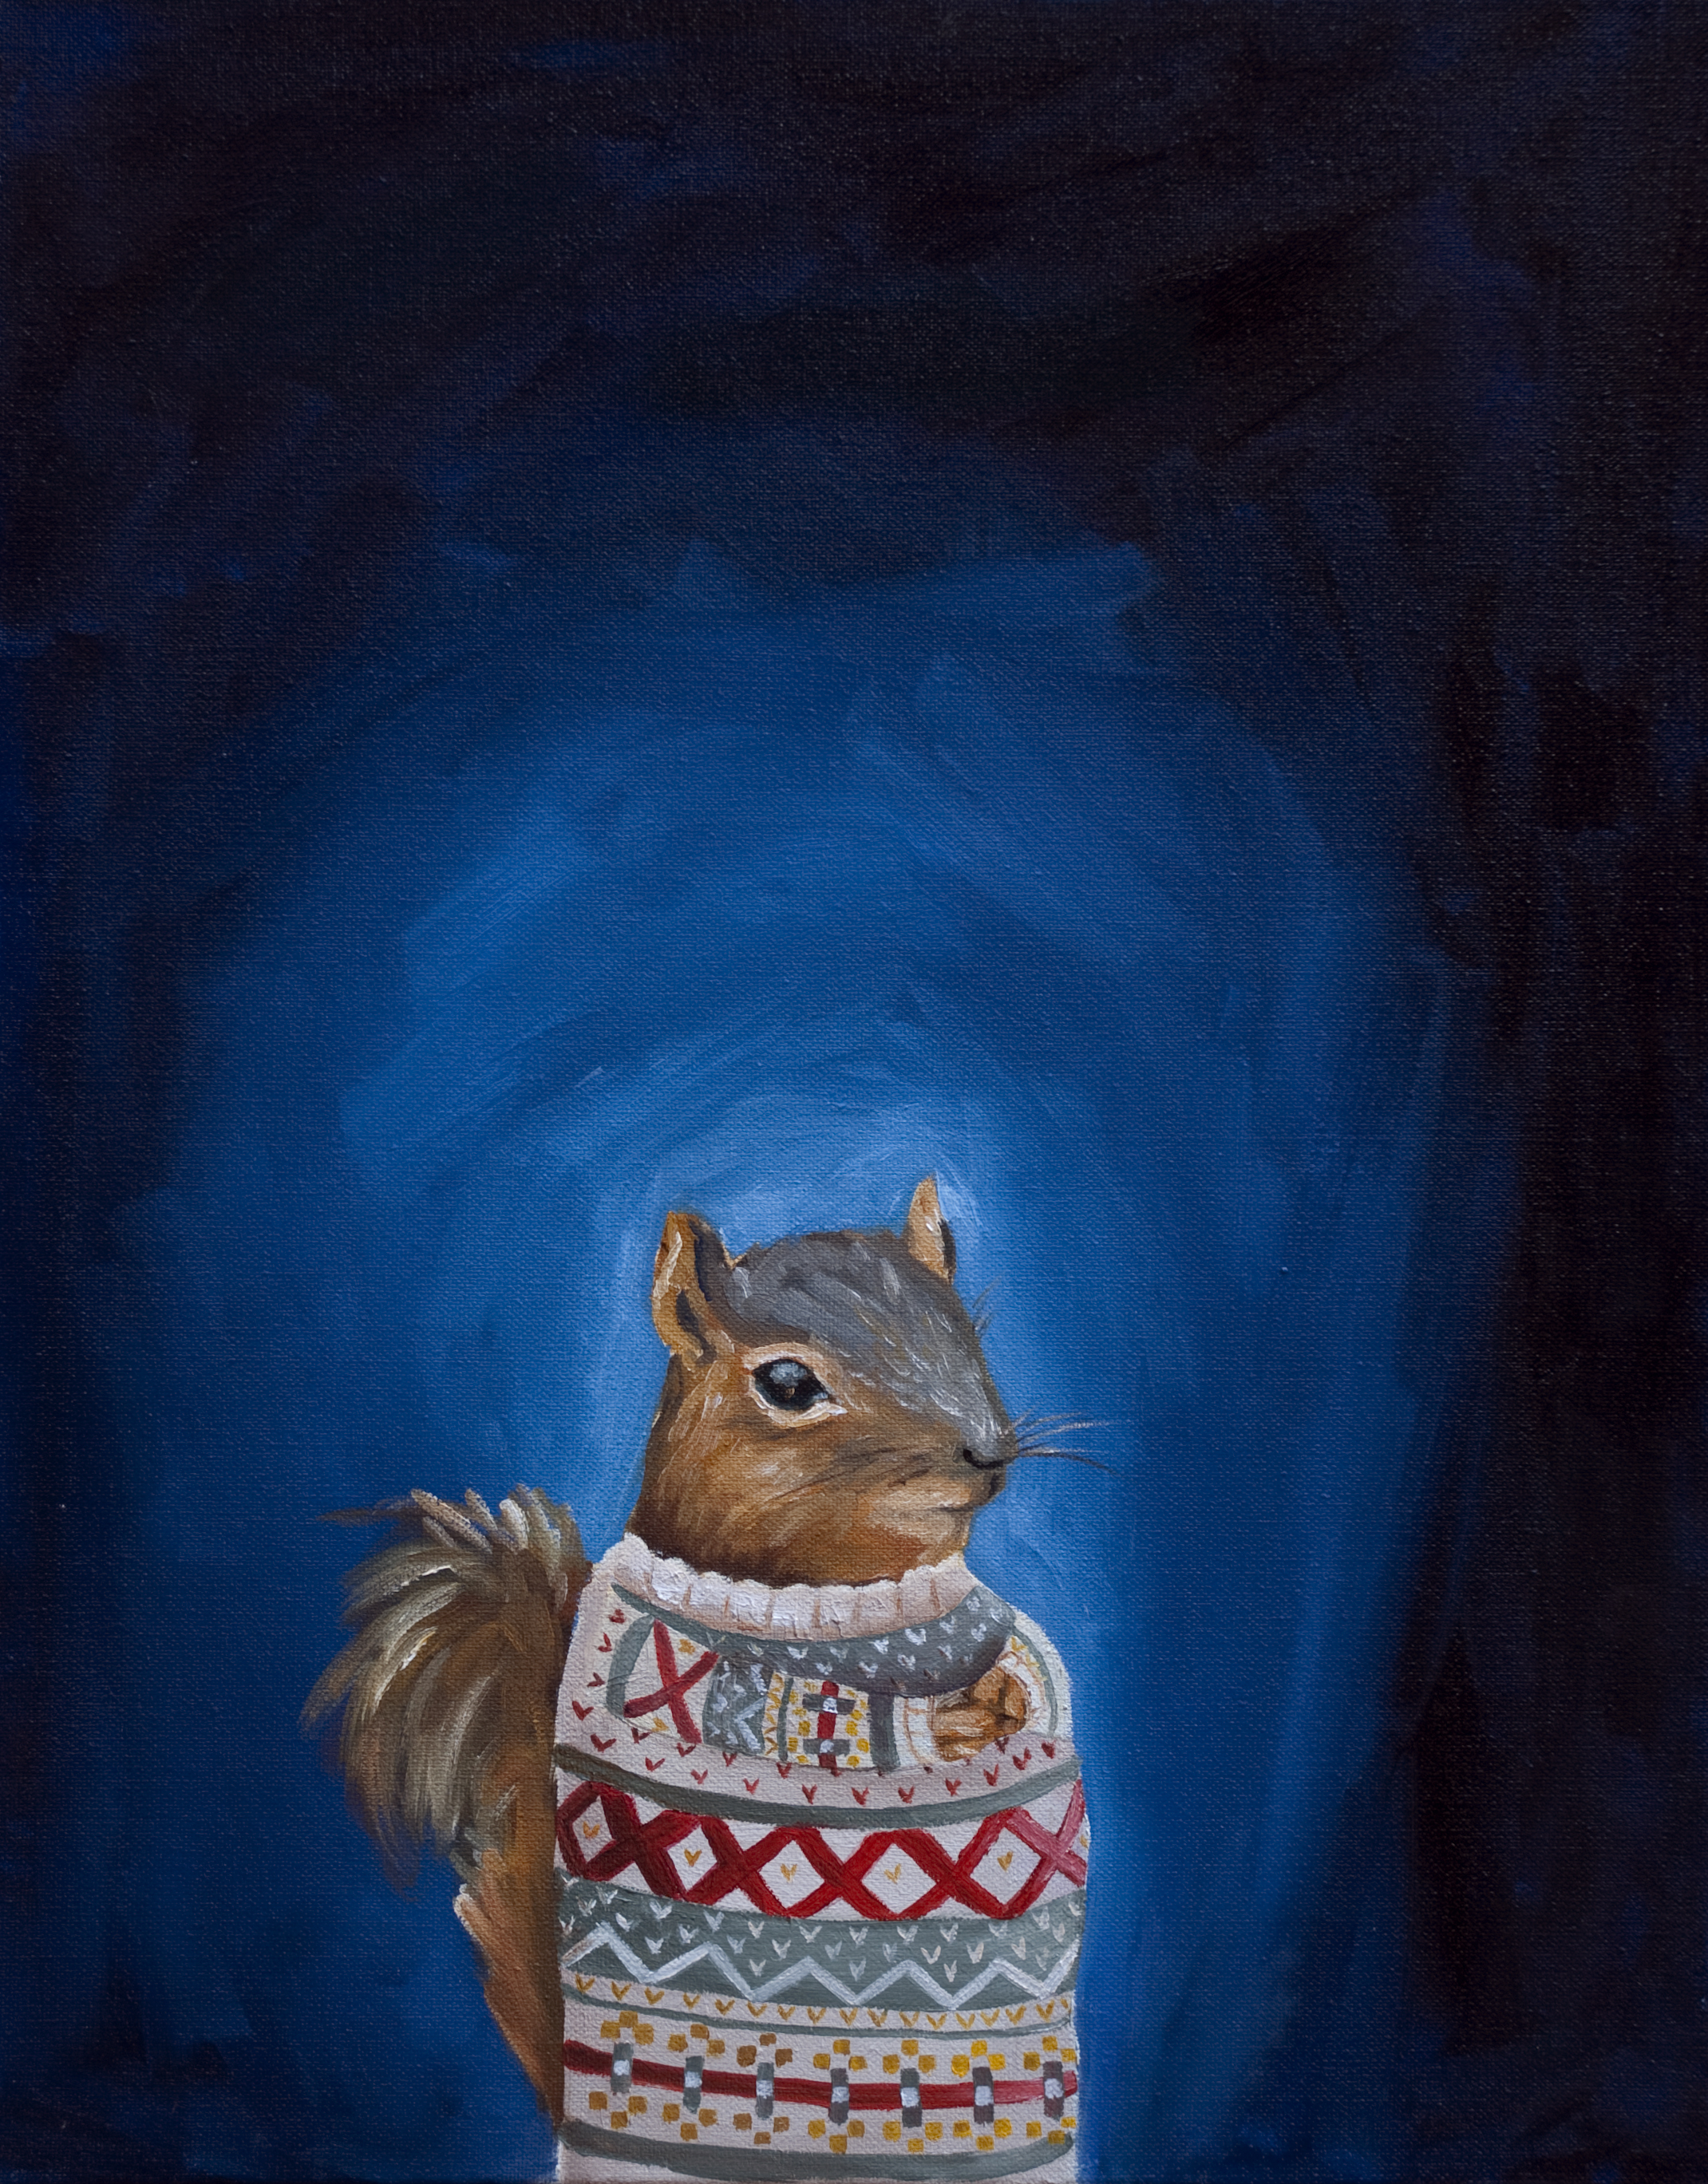 Squirrel_reshoot.jpg